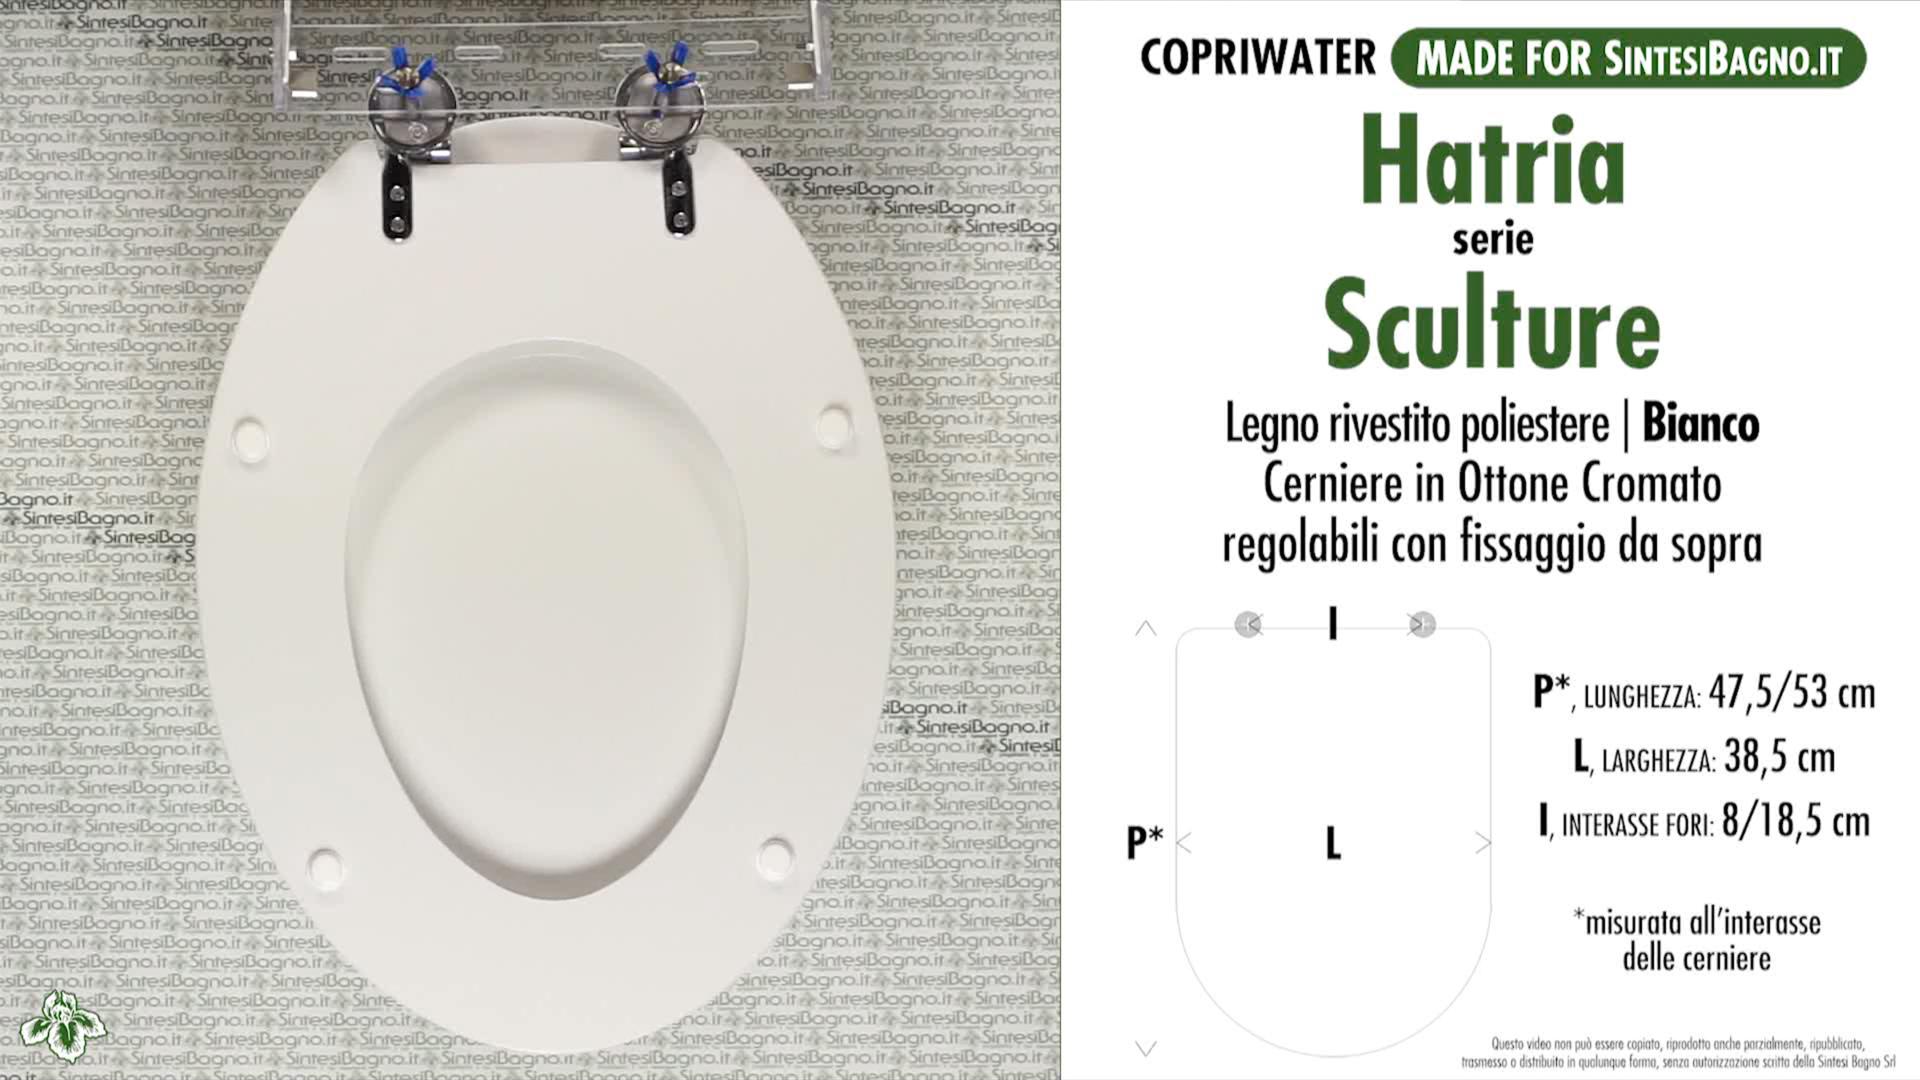 Toilet Seat SintesiBagno MADE for Hatria WC SCULTURE series ...